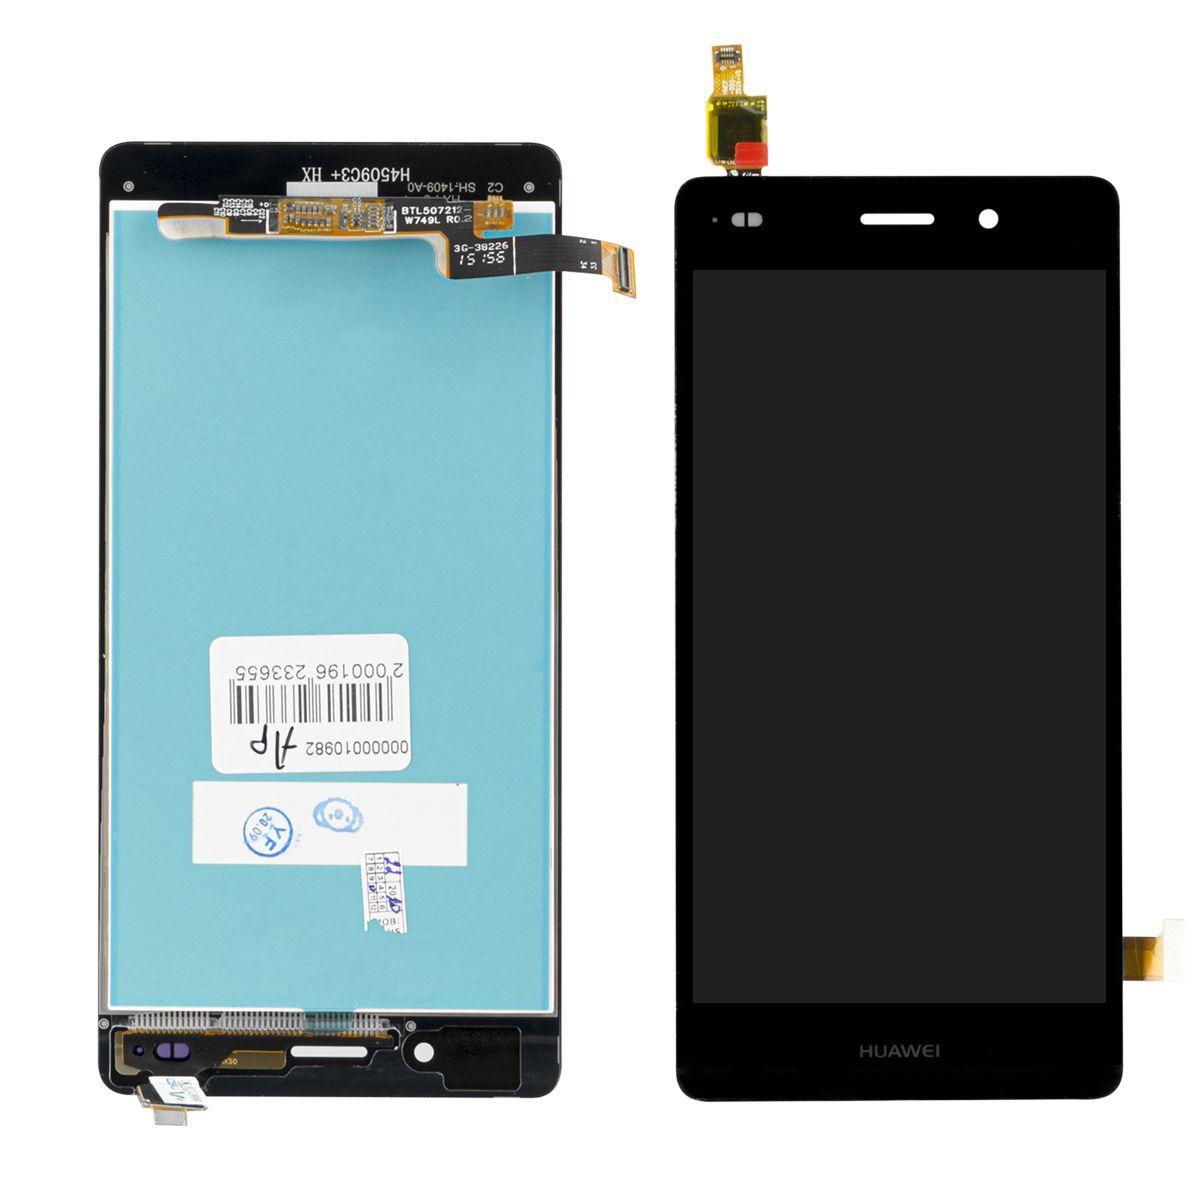 Дисплей Huawei P8 Lite (2016) в сборе в сборе Black (62)